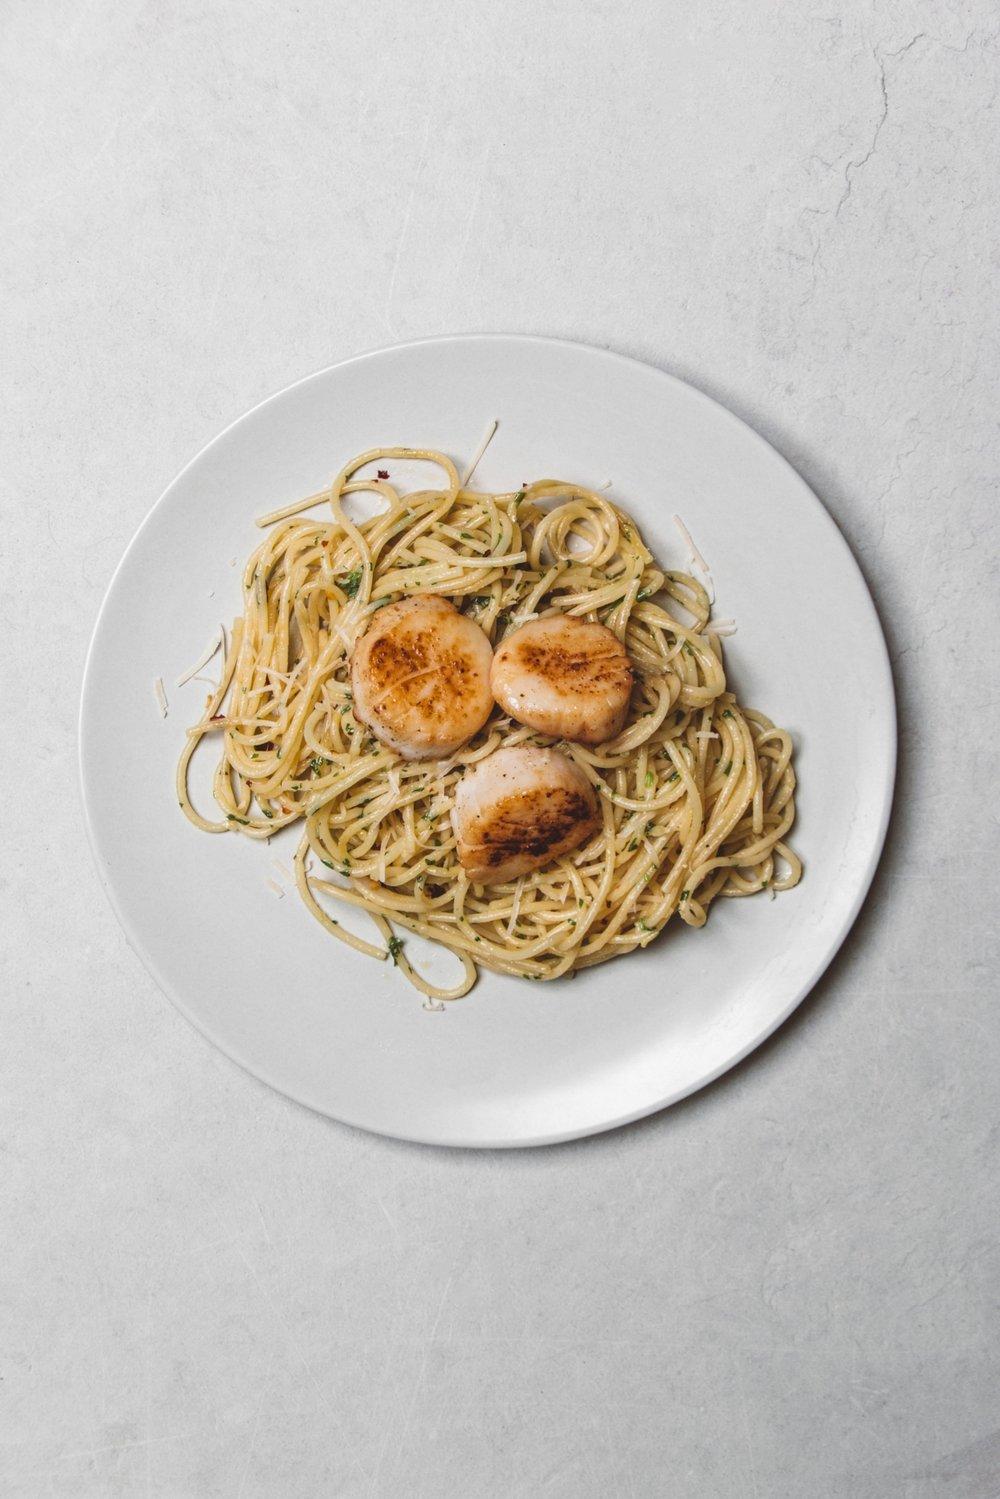 Pan Seared Scallops With Garlic And Cilantro.JPG